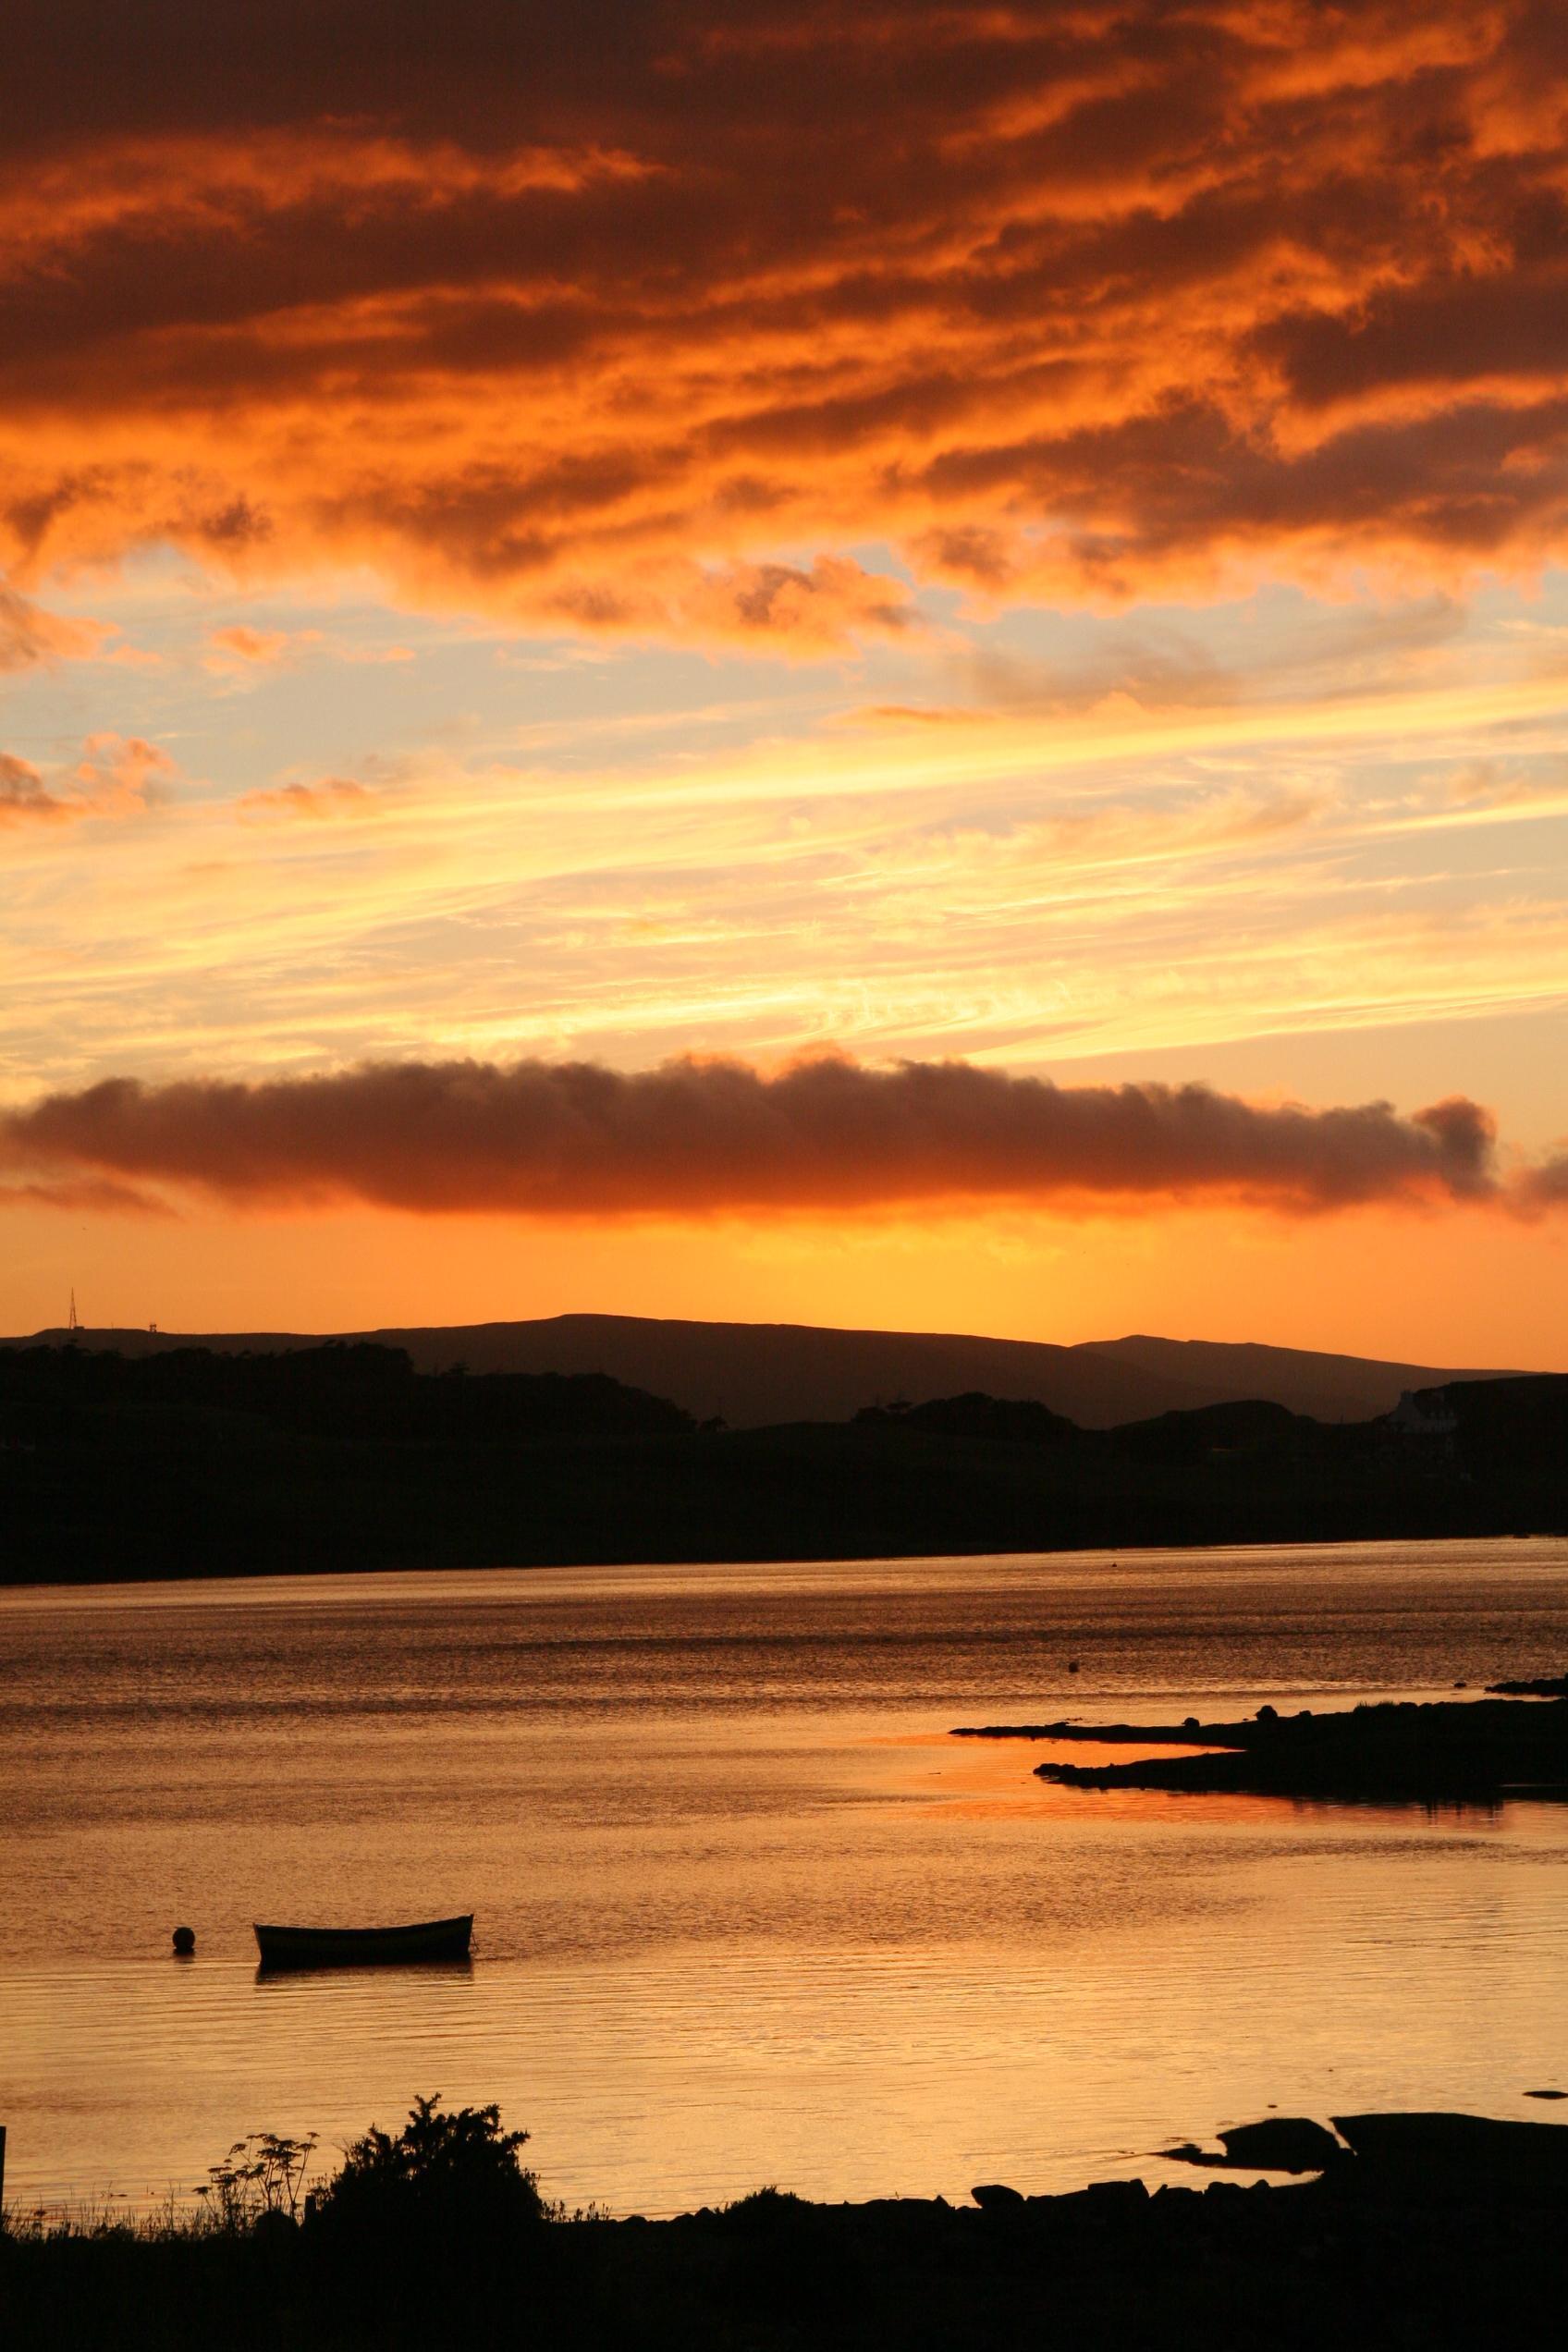 Sunset 6 - 05 Aug 08.JPG